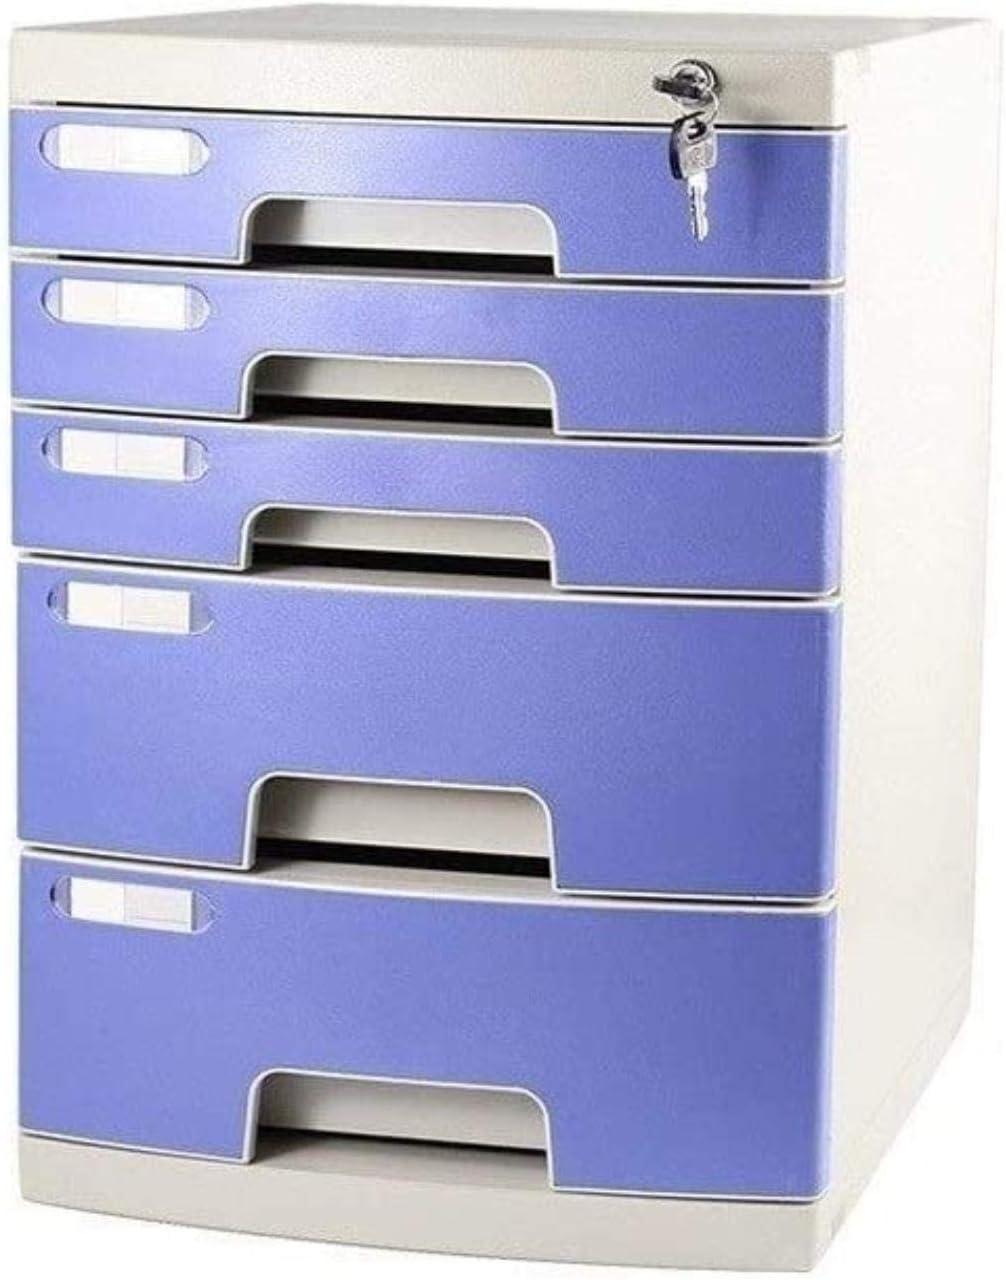 File cabinet Louisville-Jefferson County Mall Cabinet-Desktop Lock NEW before selling ☆ Ca Plastic Storage Drawer